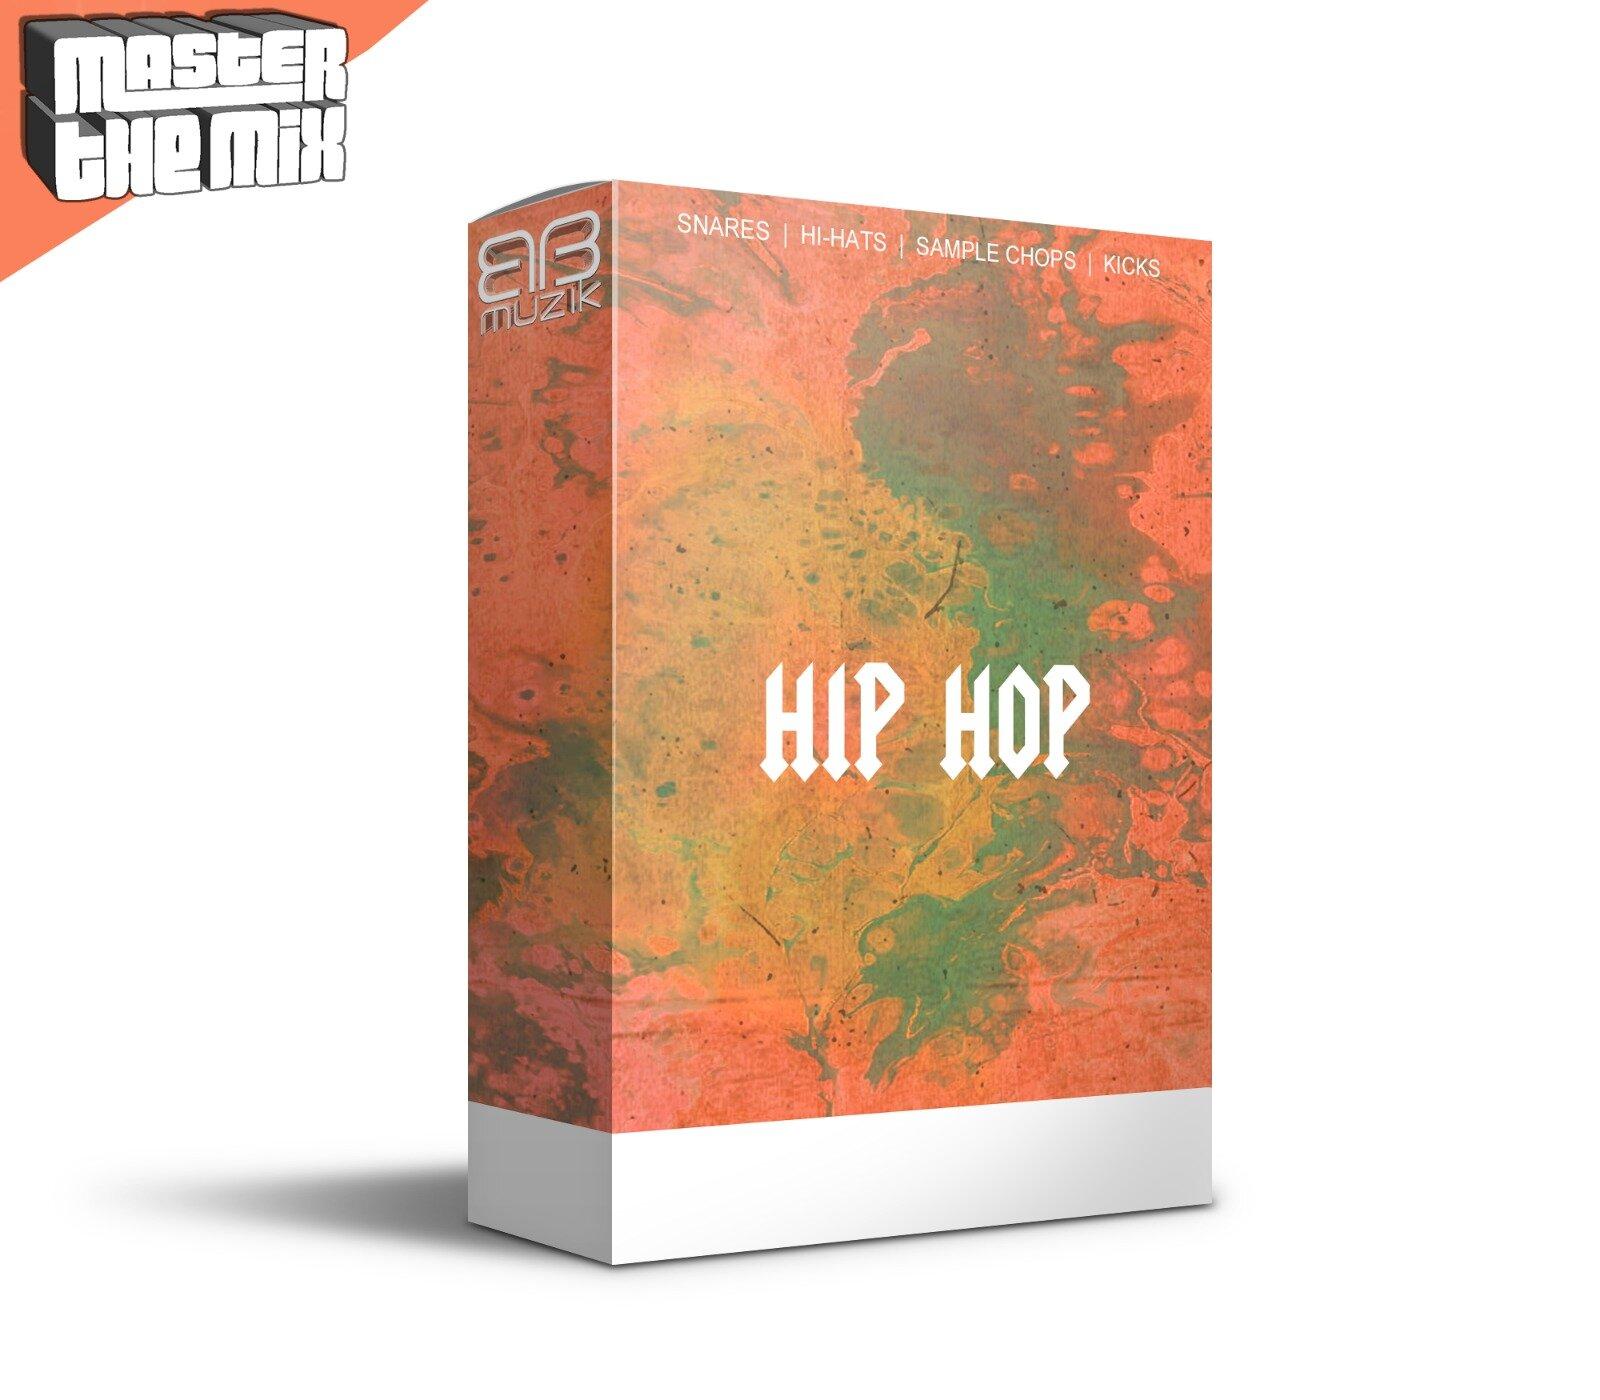 Hiphop.jpeg